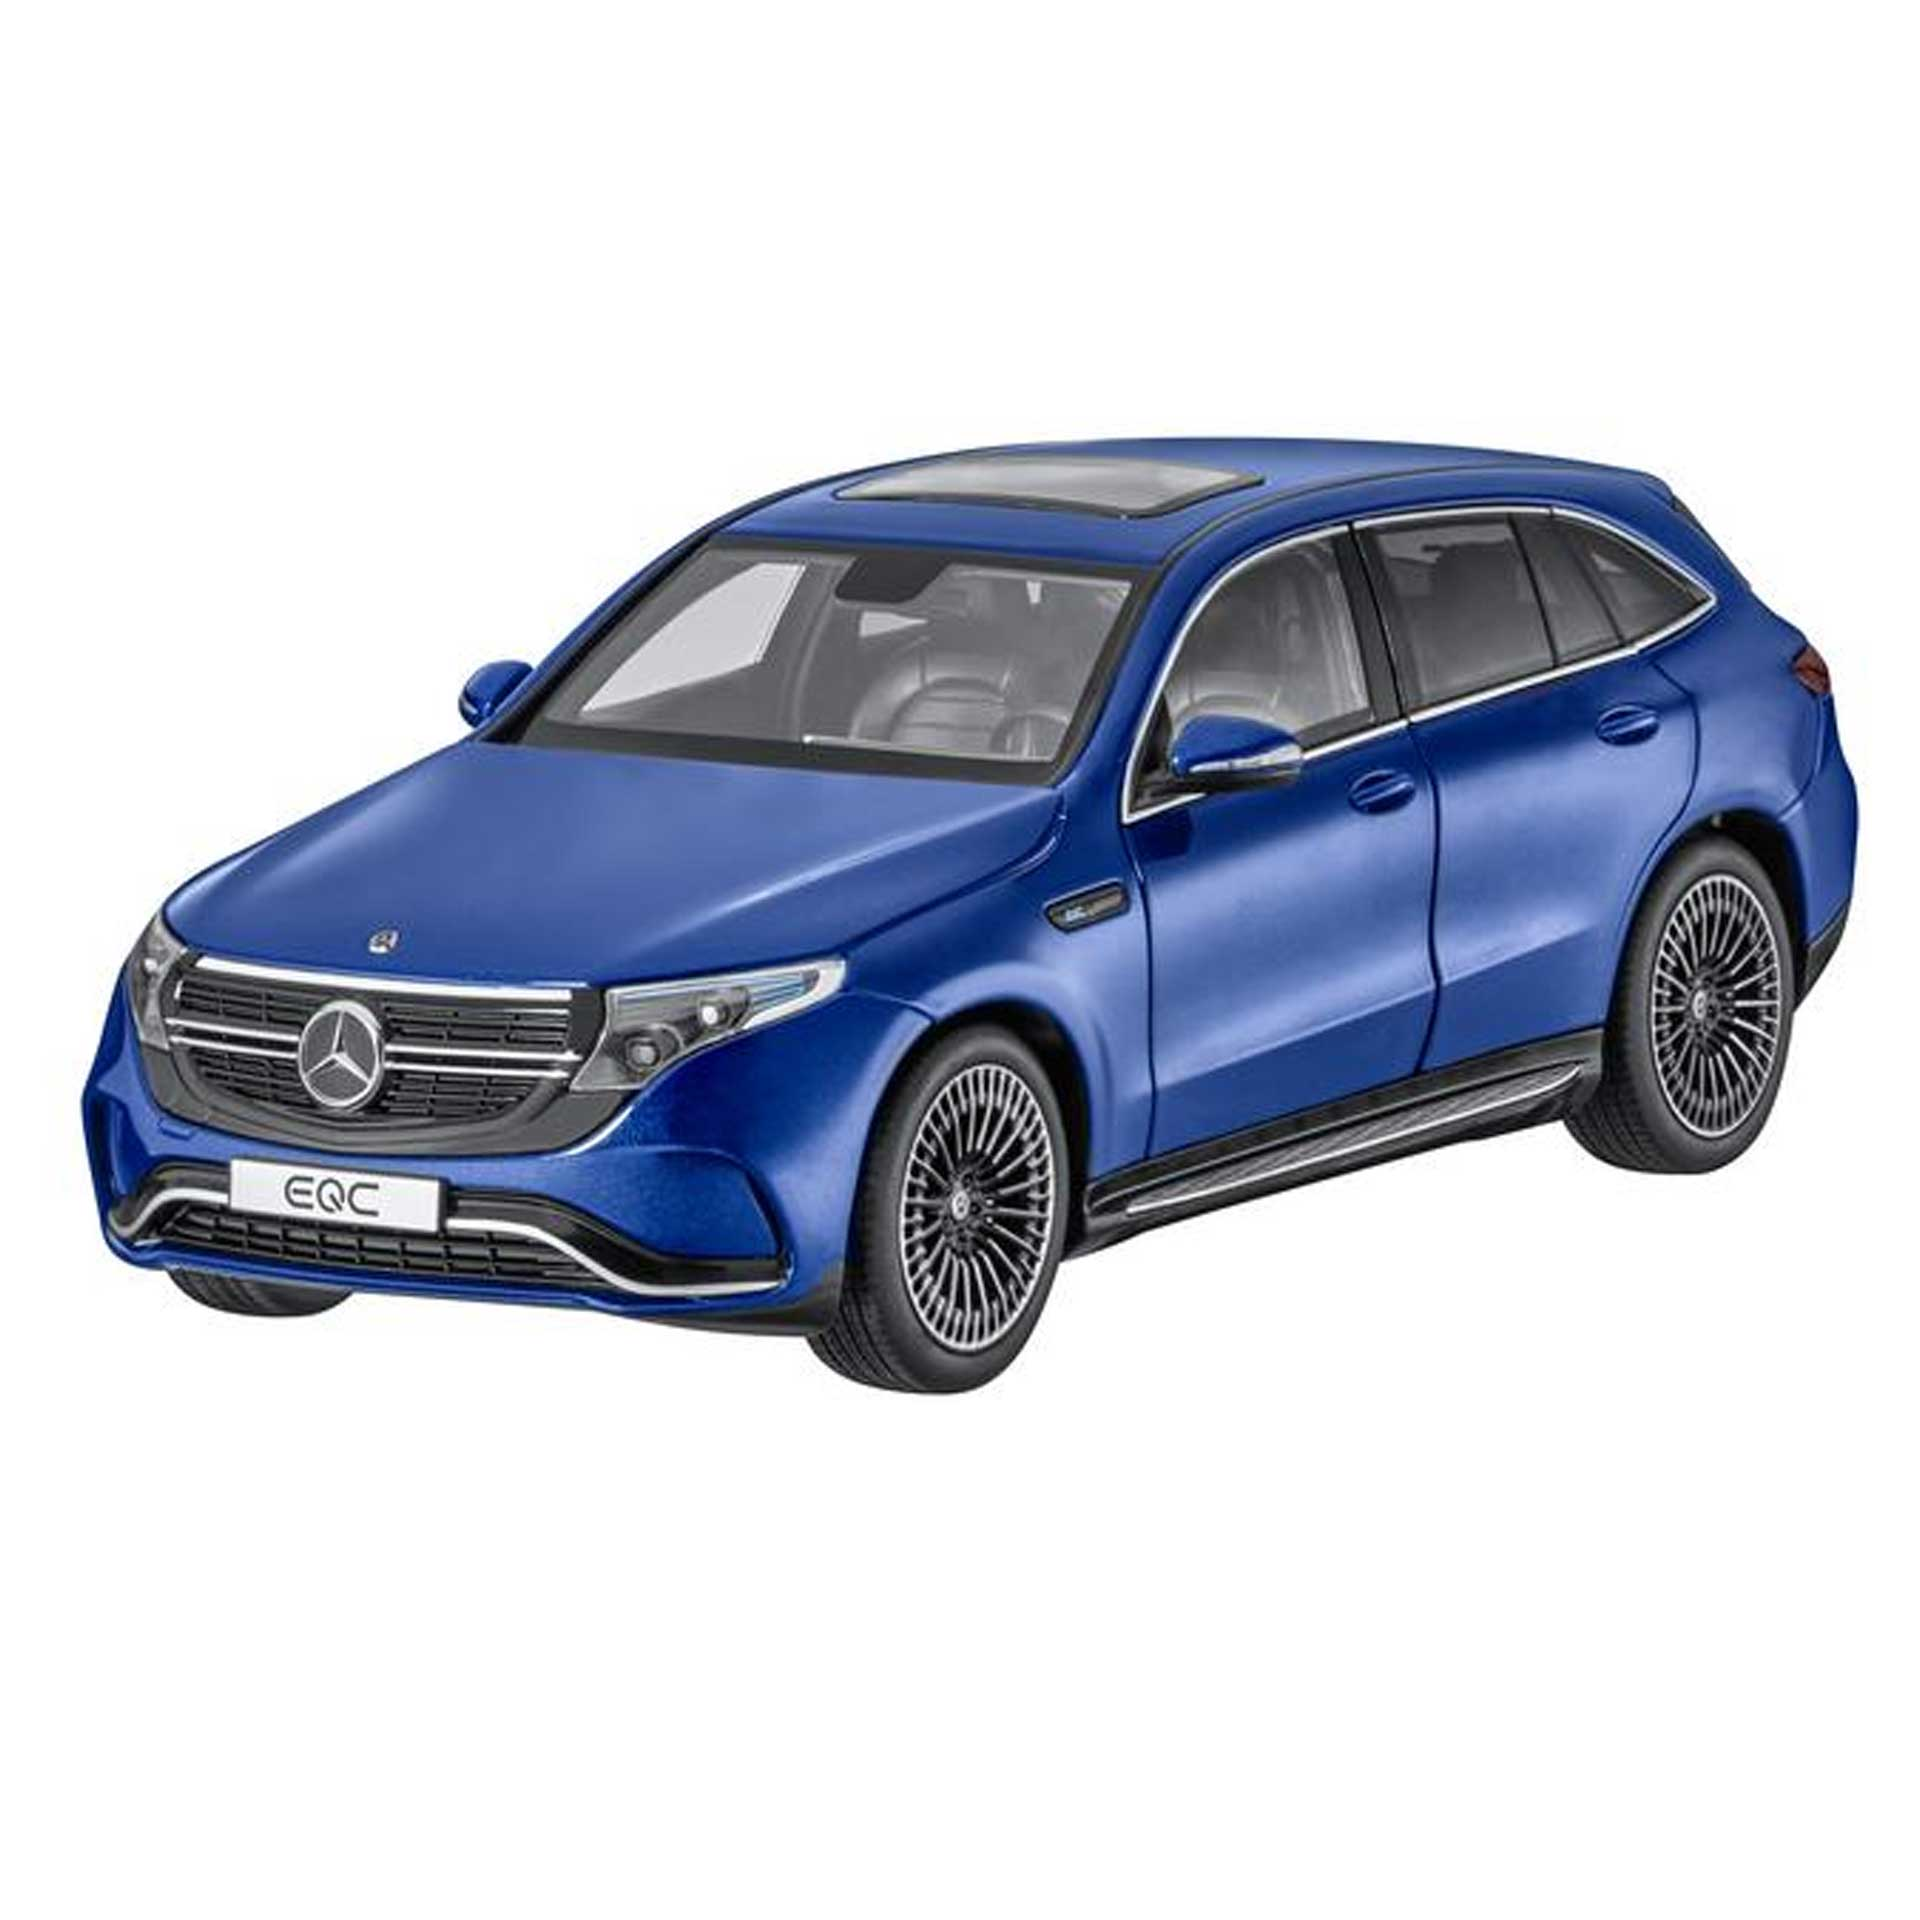 Mercedes-Benz Modellauto EQC N293 1:18 brillantblau